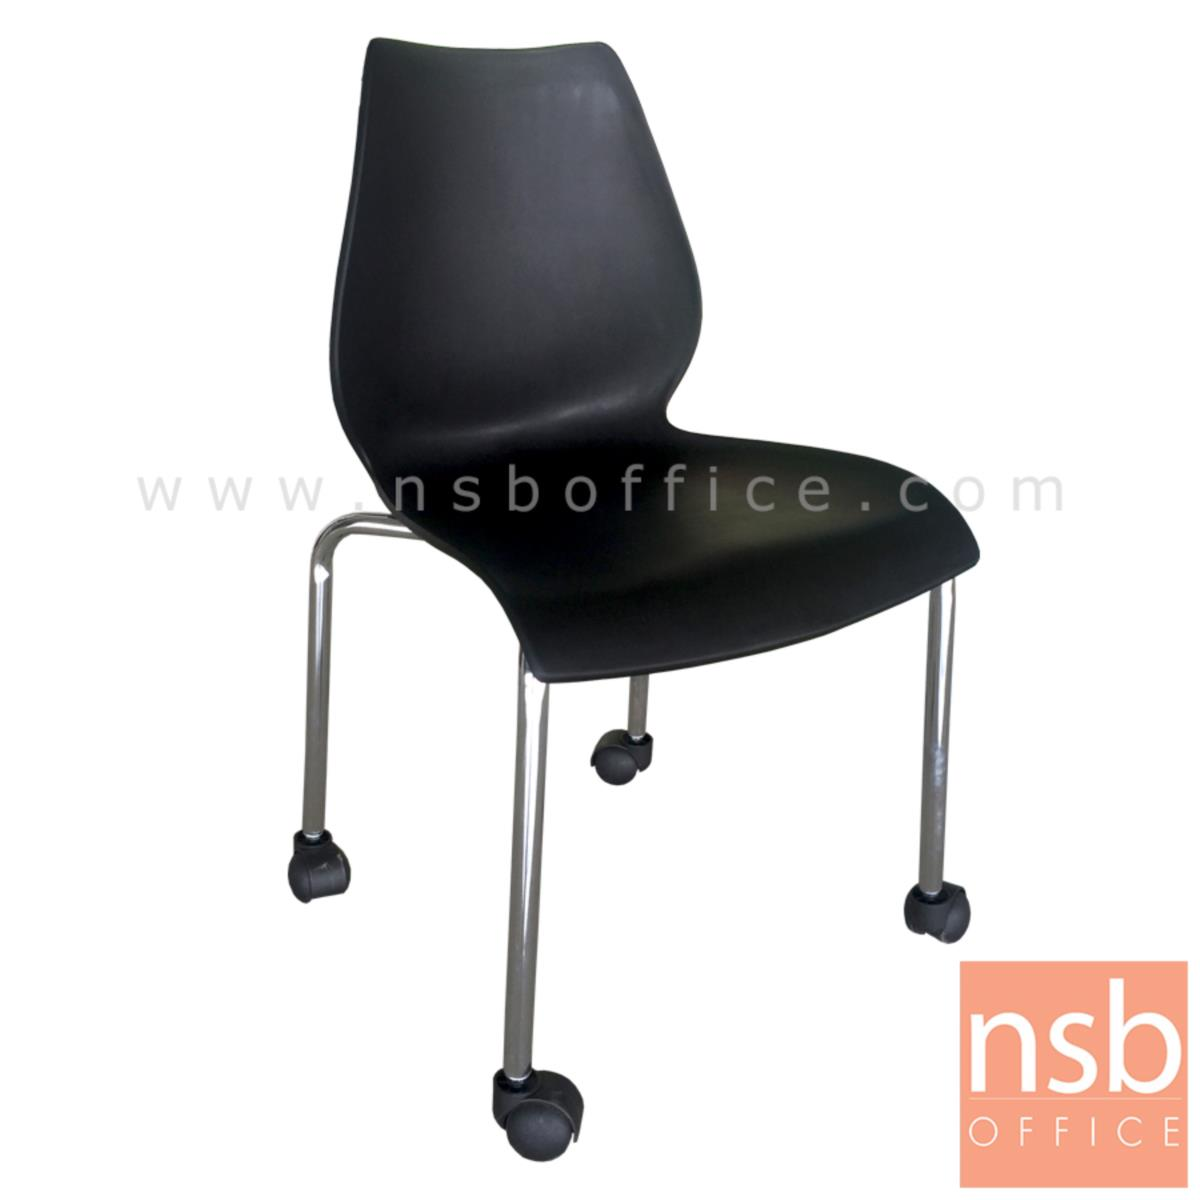 B29A055:เก้าอี้อเนกประสงค์เฟรมโพลี่ รุ่น Swizzle (สวิซเซิล)  ขาเหล็กชุบโครเมี่ยม ล้อเลื่อน